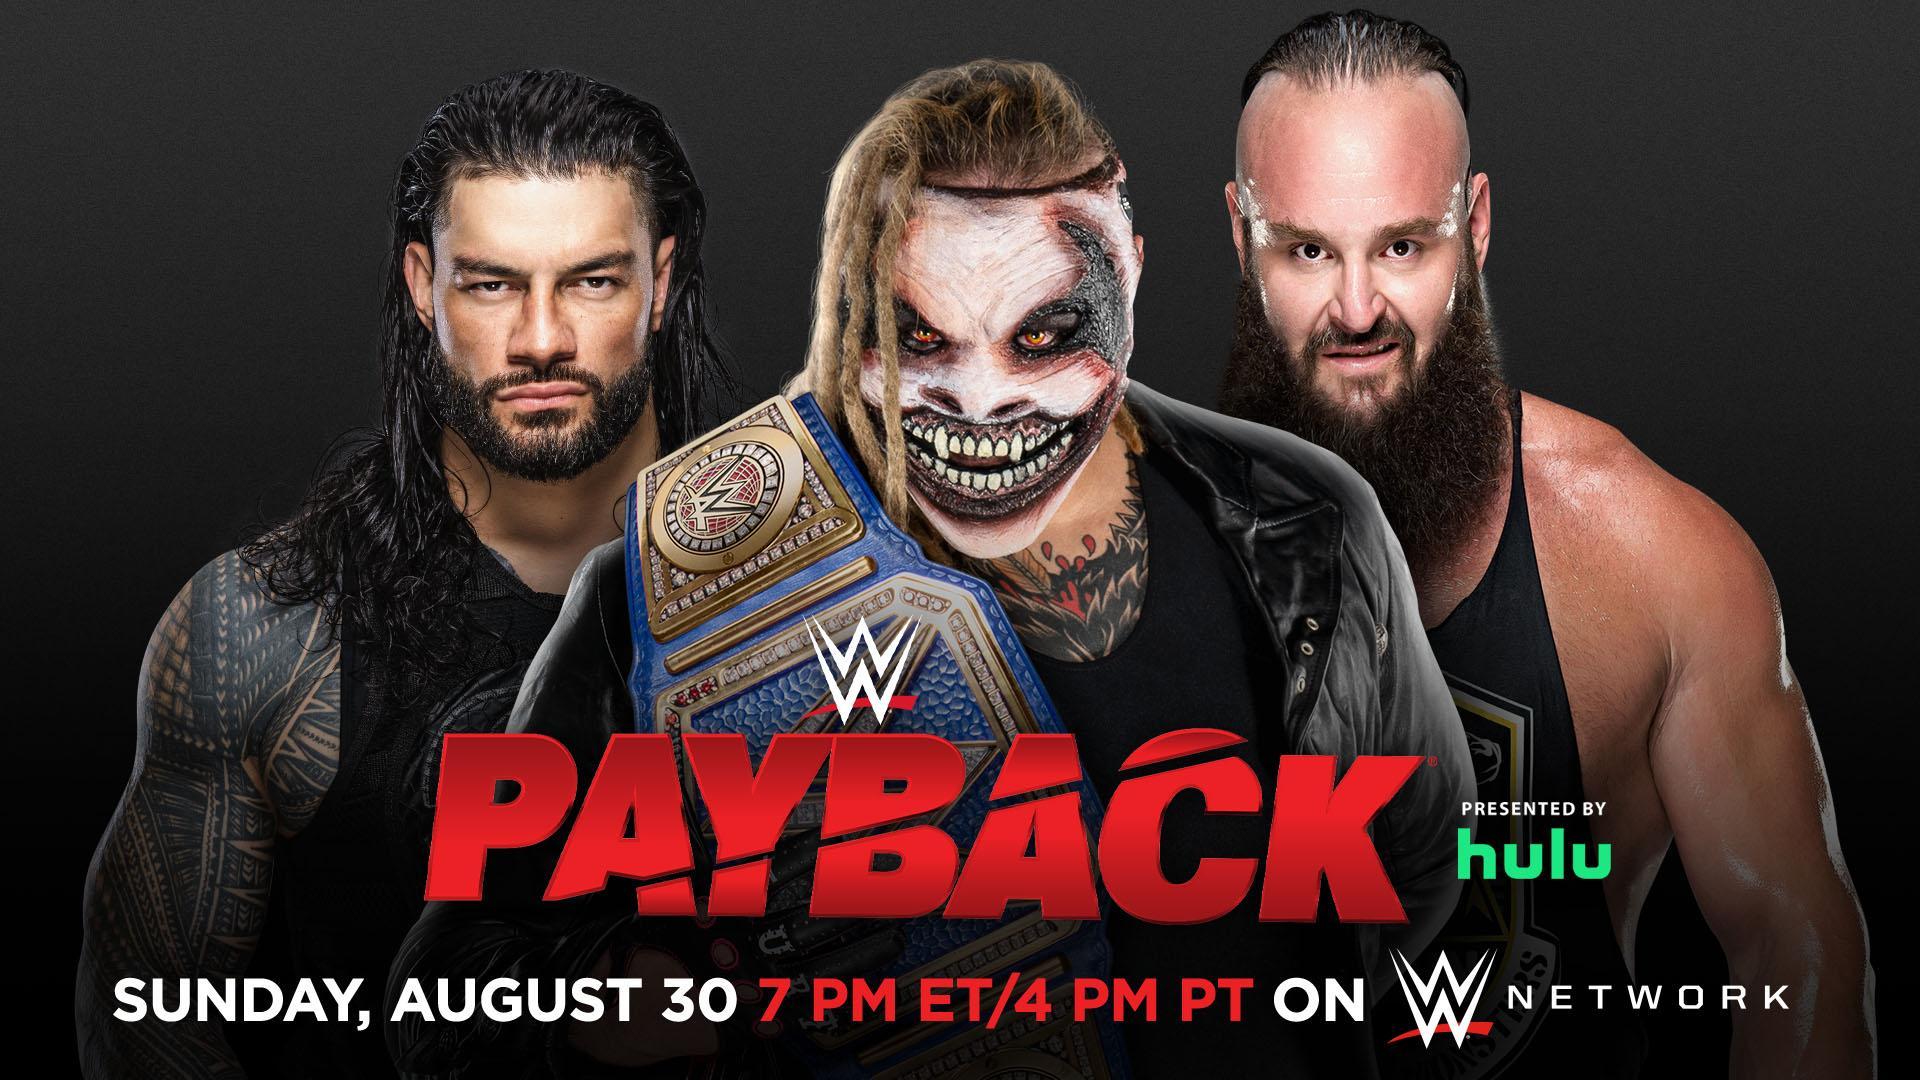 WWE Confirms Roman Reigns' Payback Match